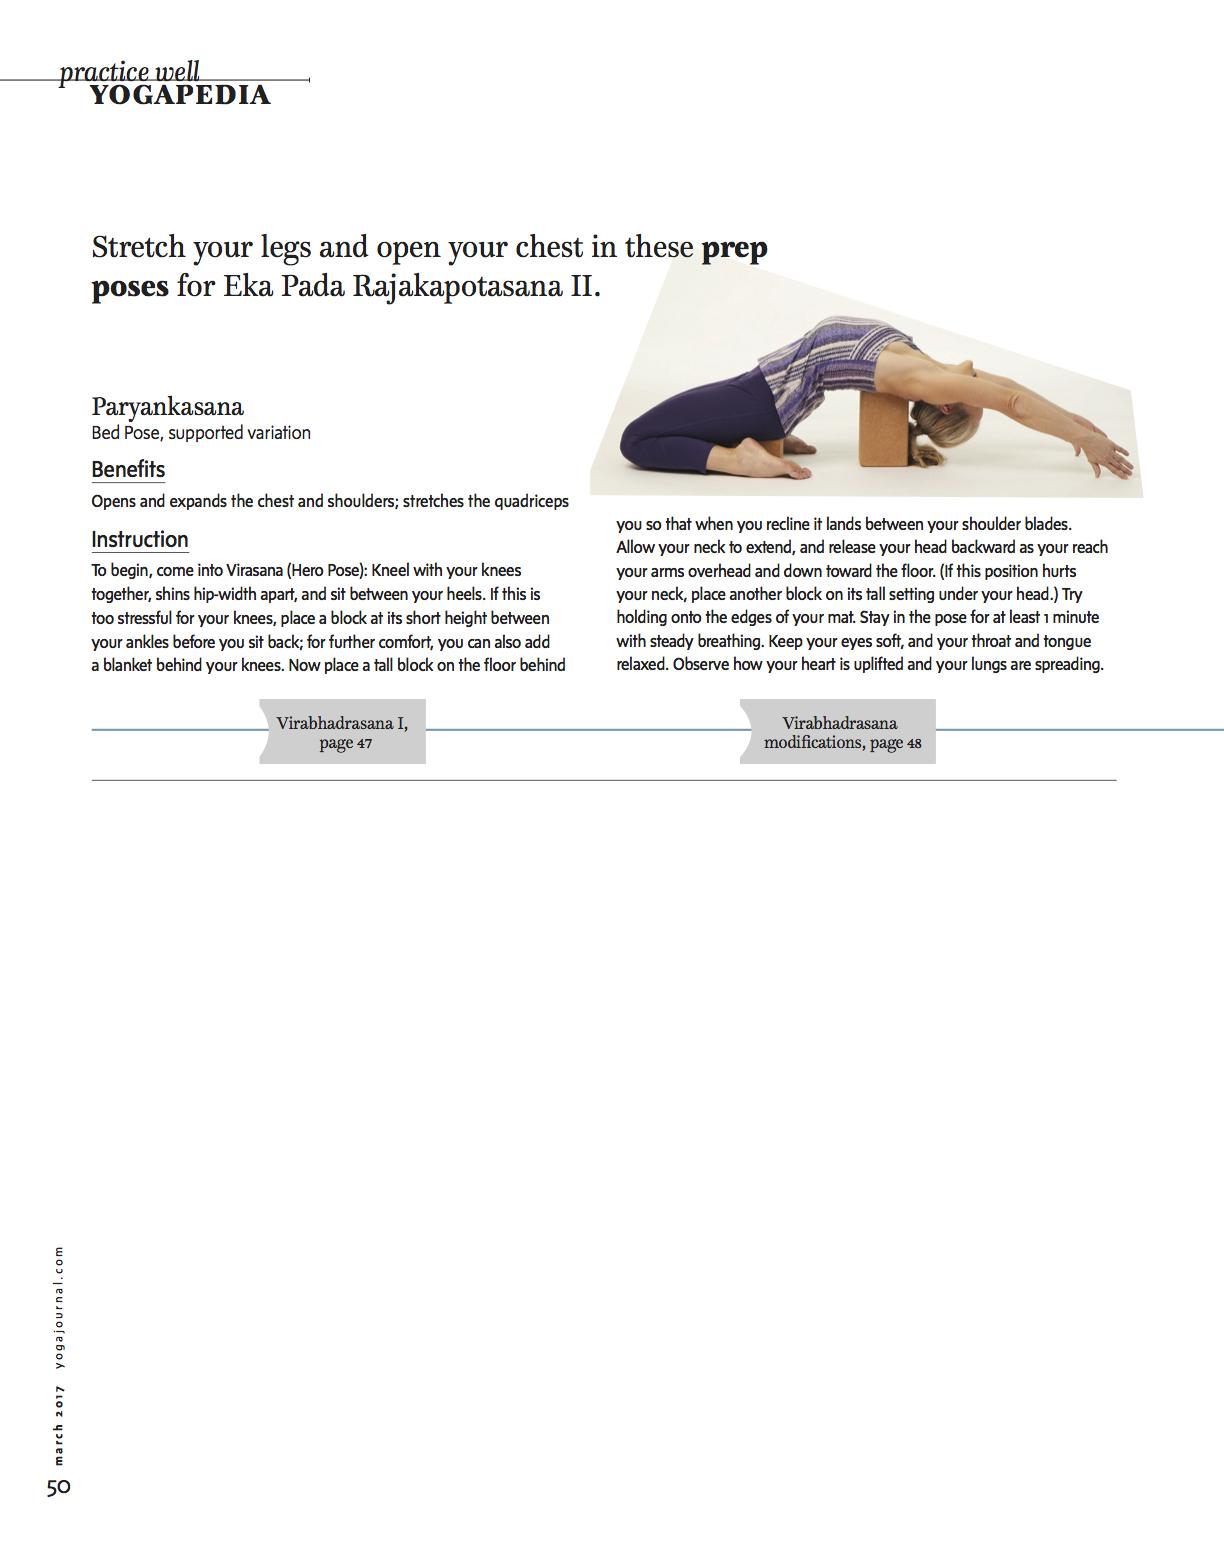 March Yogapedia page 3.jpg